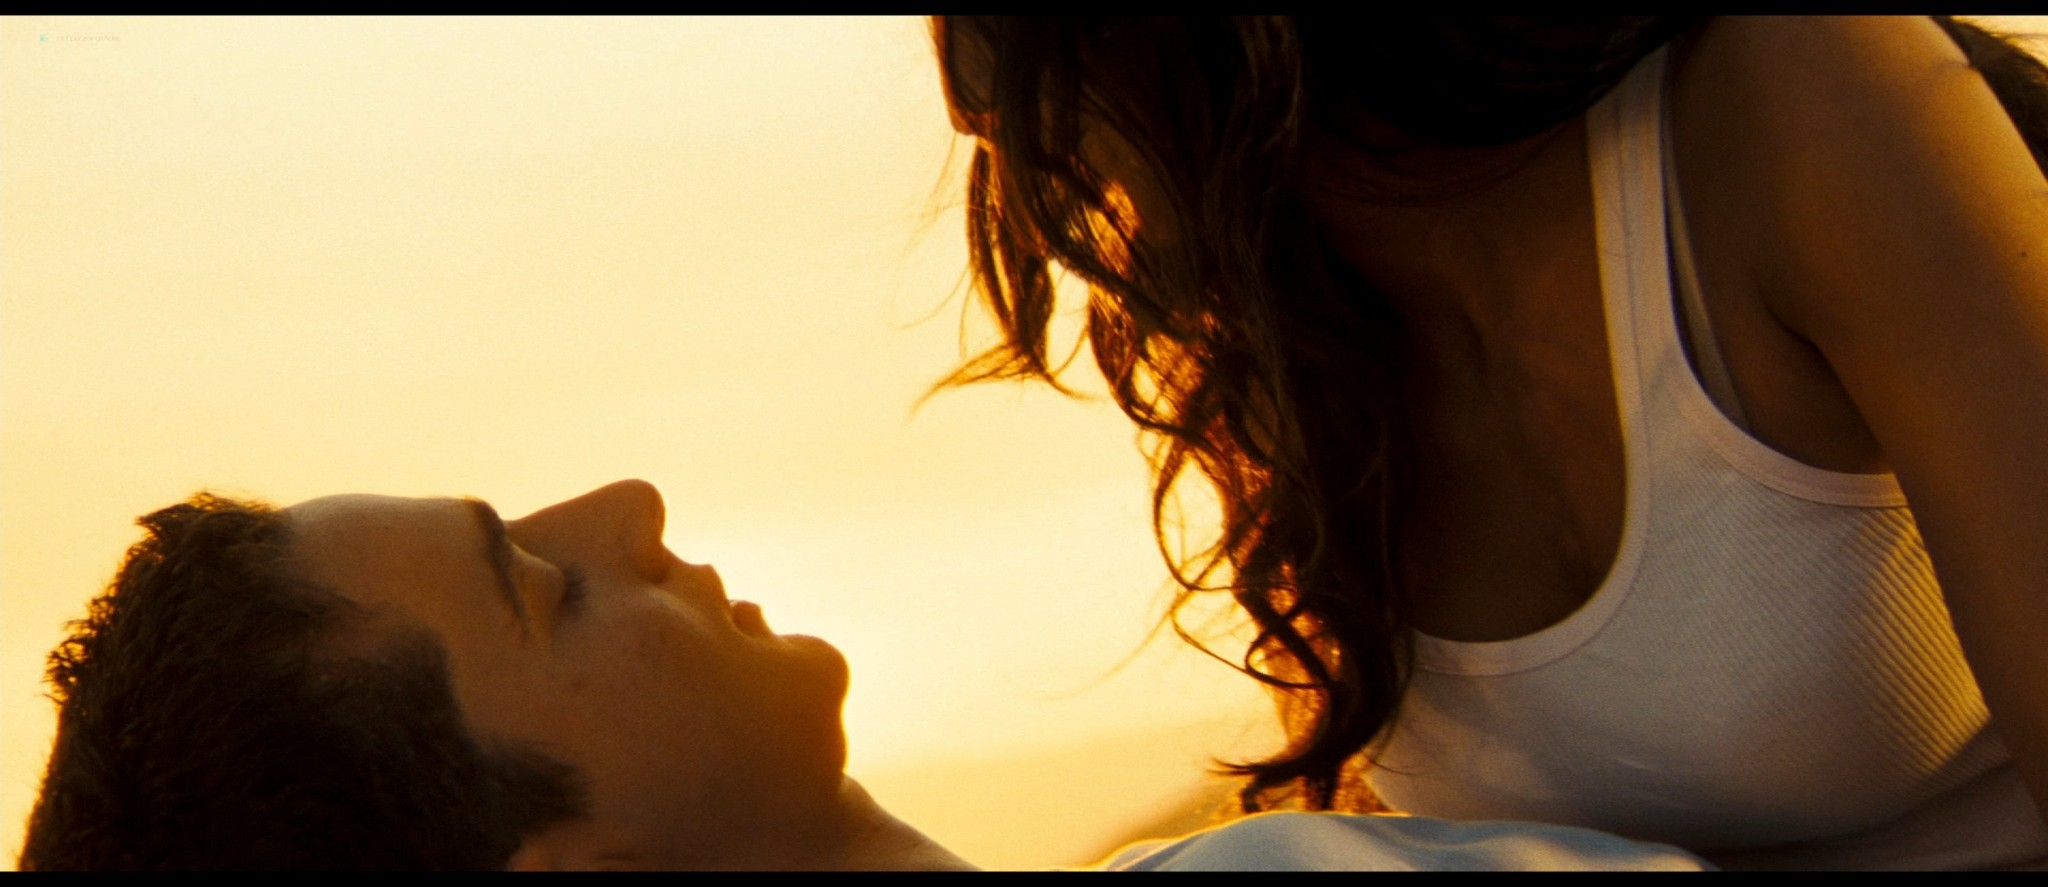 Megan Fox hot and sexy - Transformers (2007) HD 1080p BluRay Remux (3)